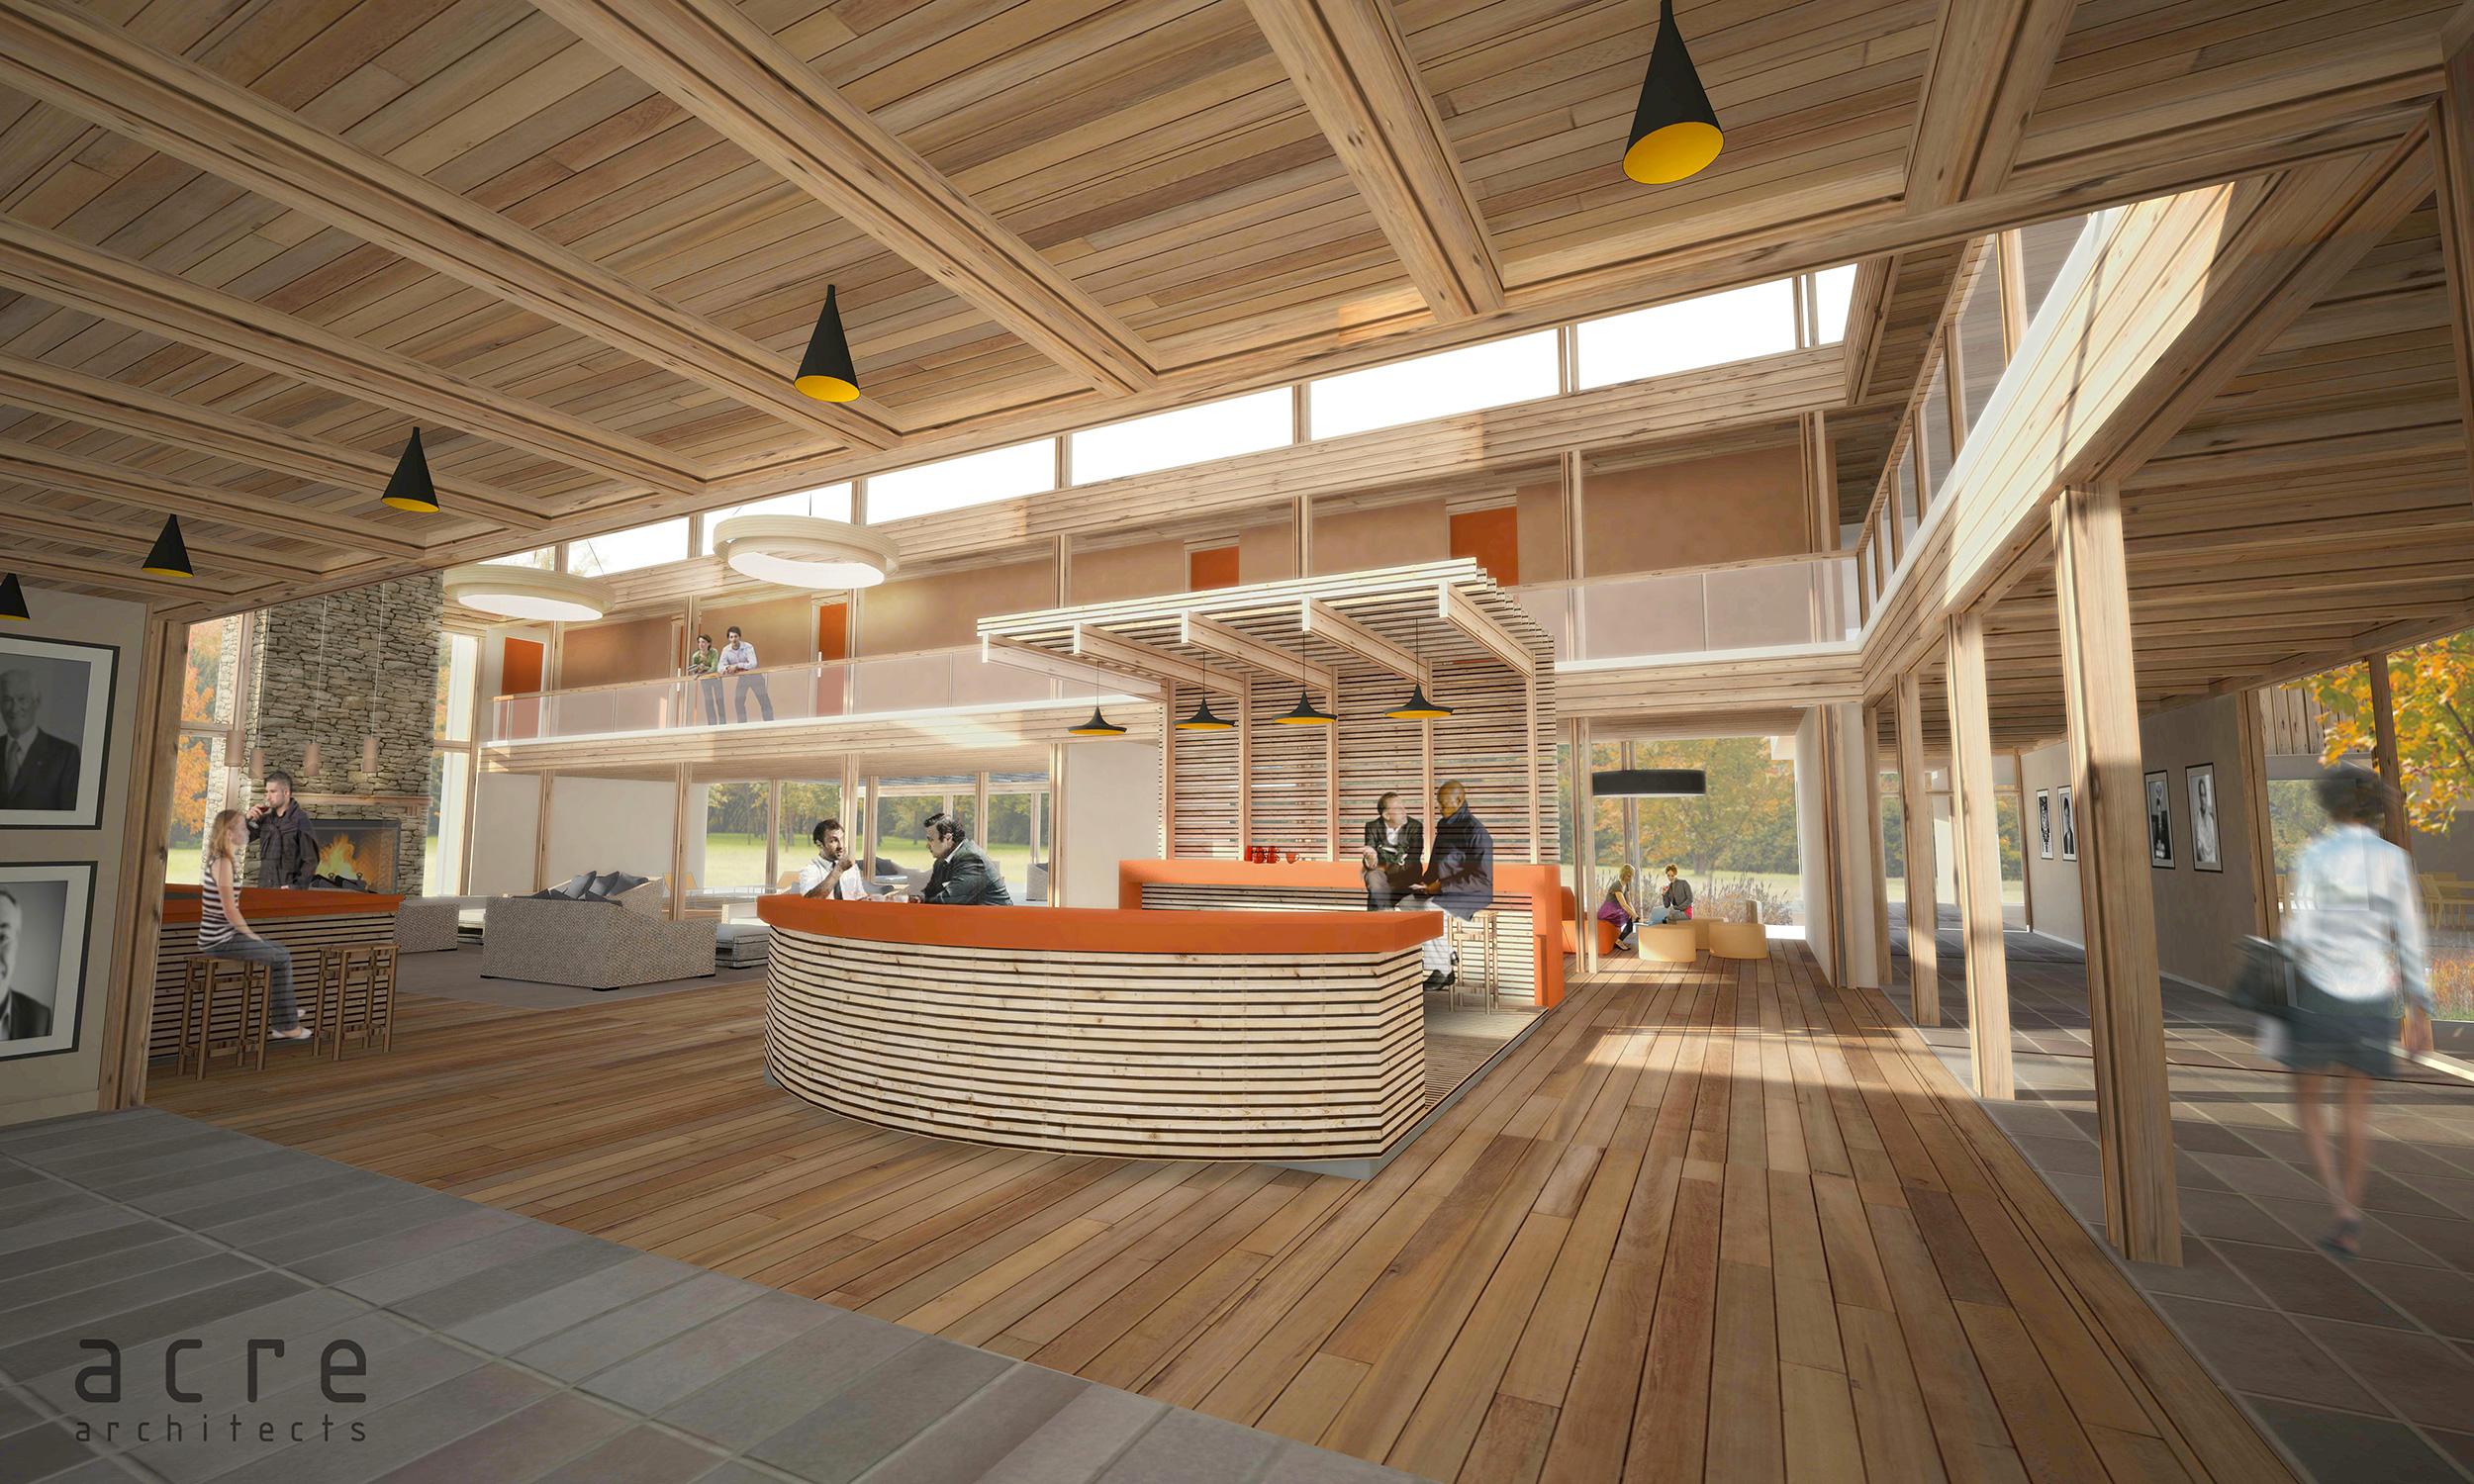 Prix du jeune architecte laur ate de 2015 institut for Jeune architecte